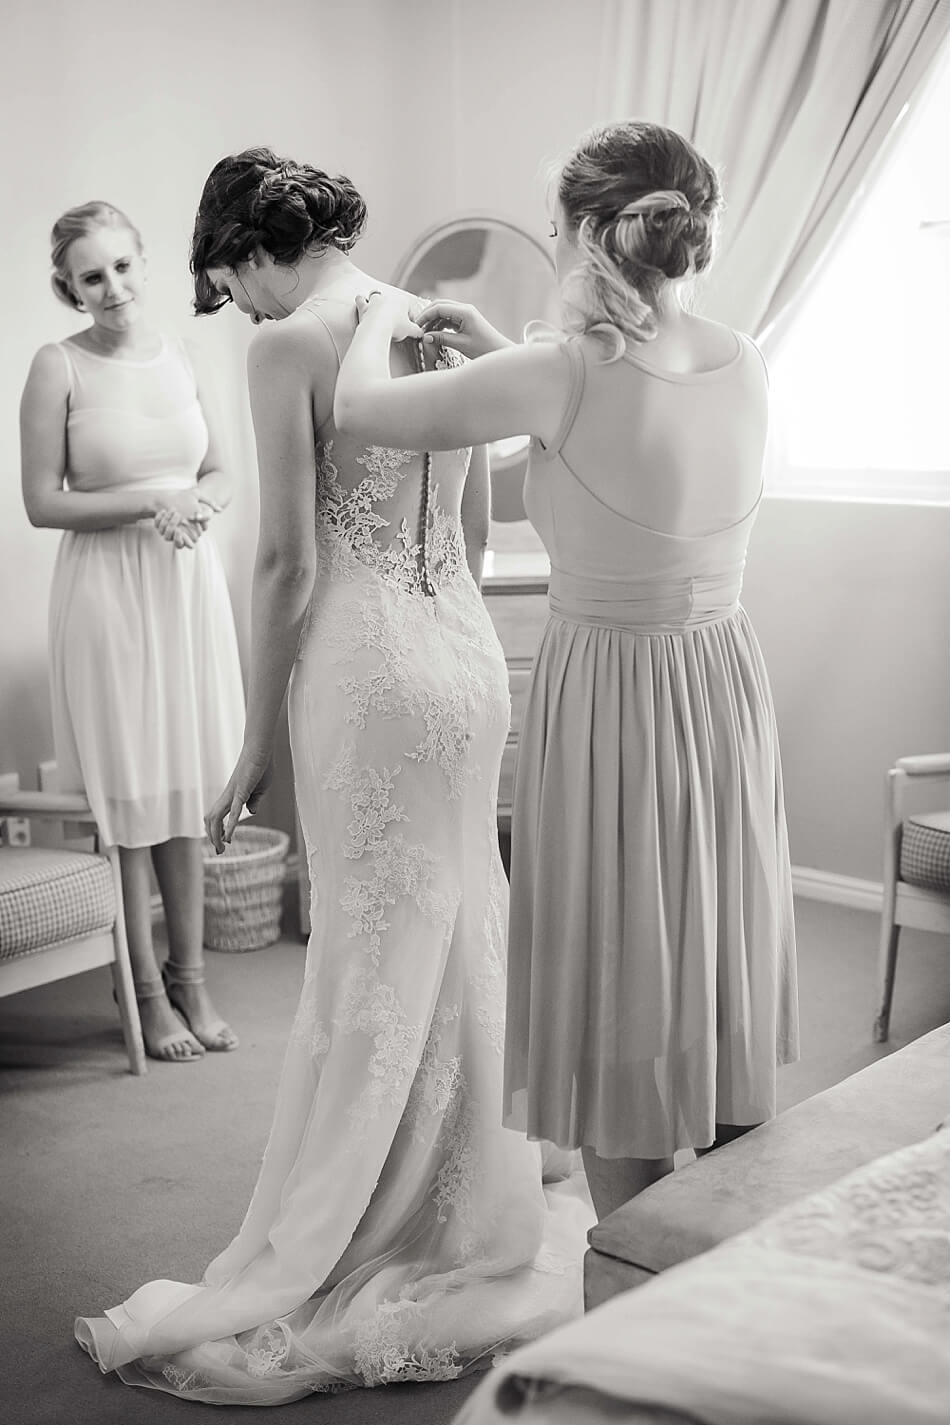 nikki-meyer_landtscap_stellenbosch_wedding_photographer_014